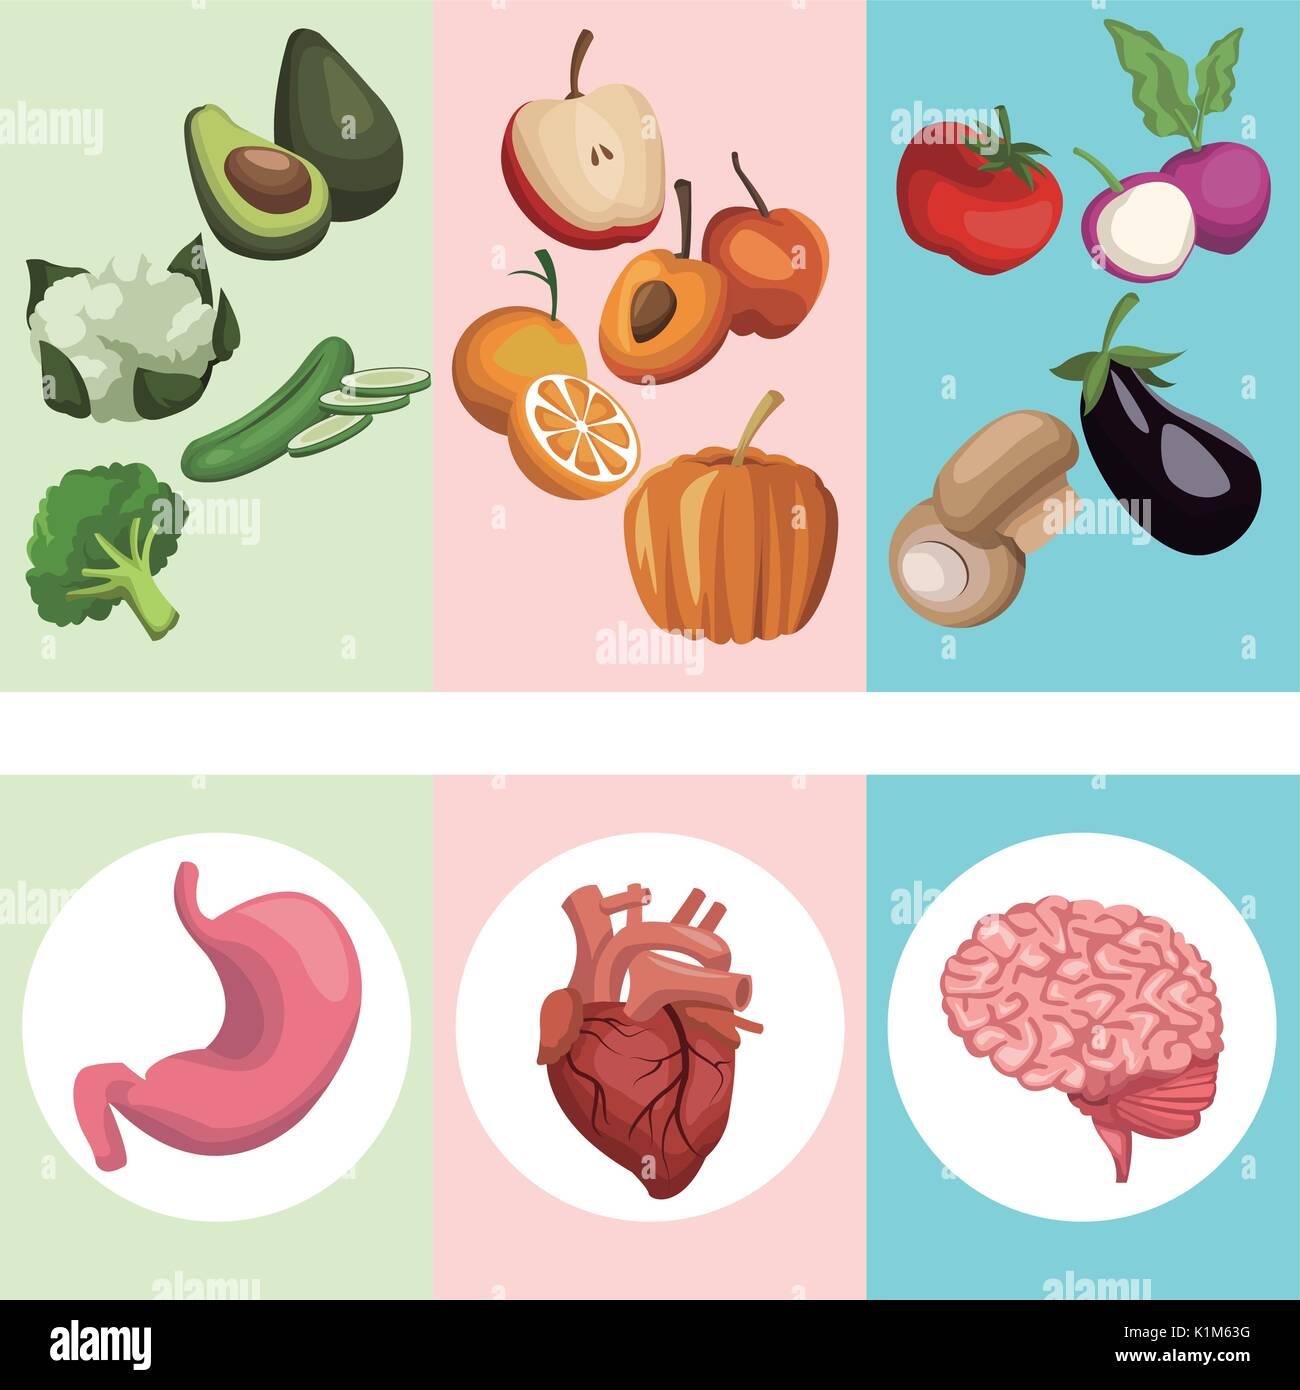 Anatomy Body Poster Stock Photos & Anatomy Body Poster Stock Images ...